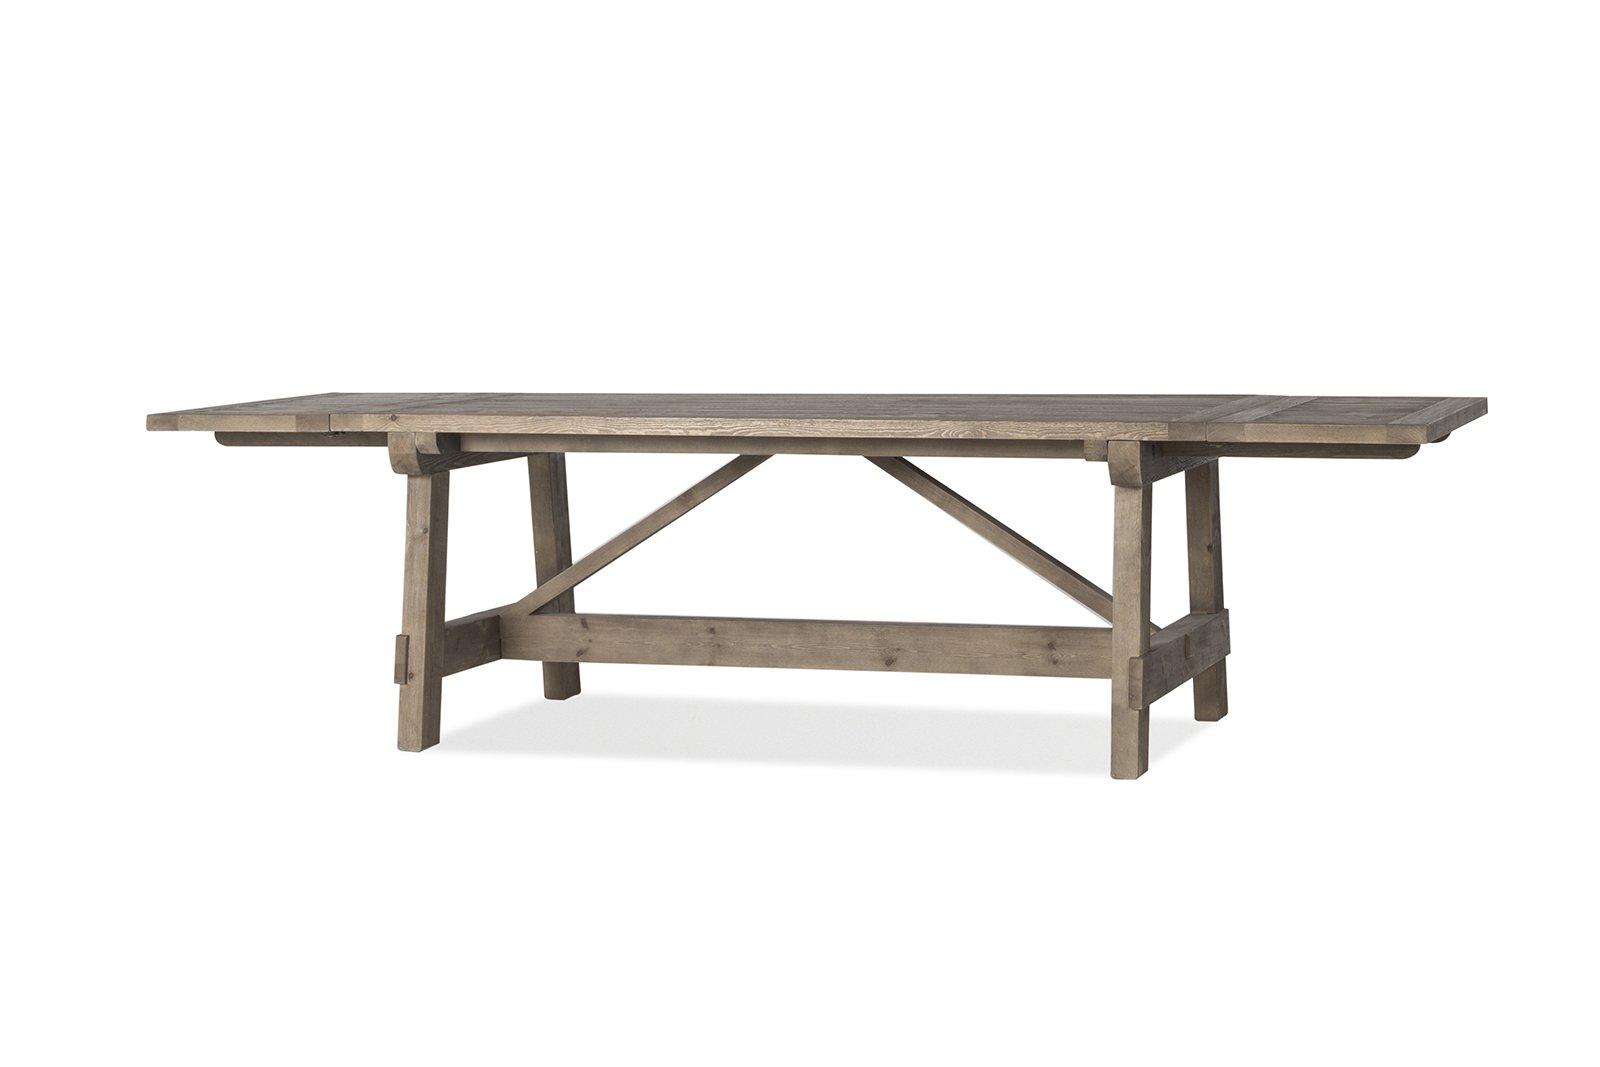 Flamant Dijon Rectangular Extension Dining Table, Weathered Pine